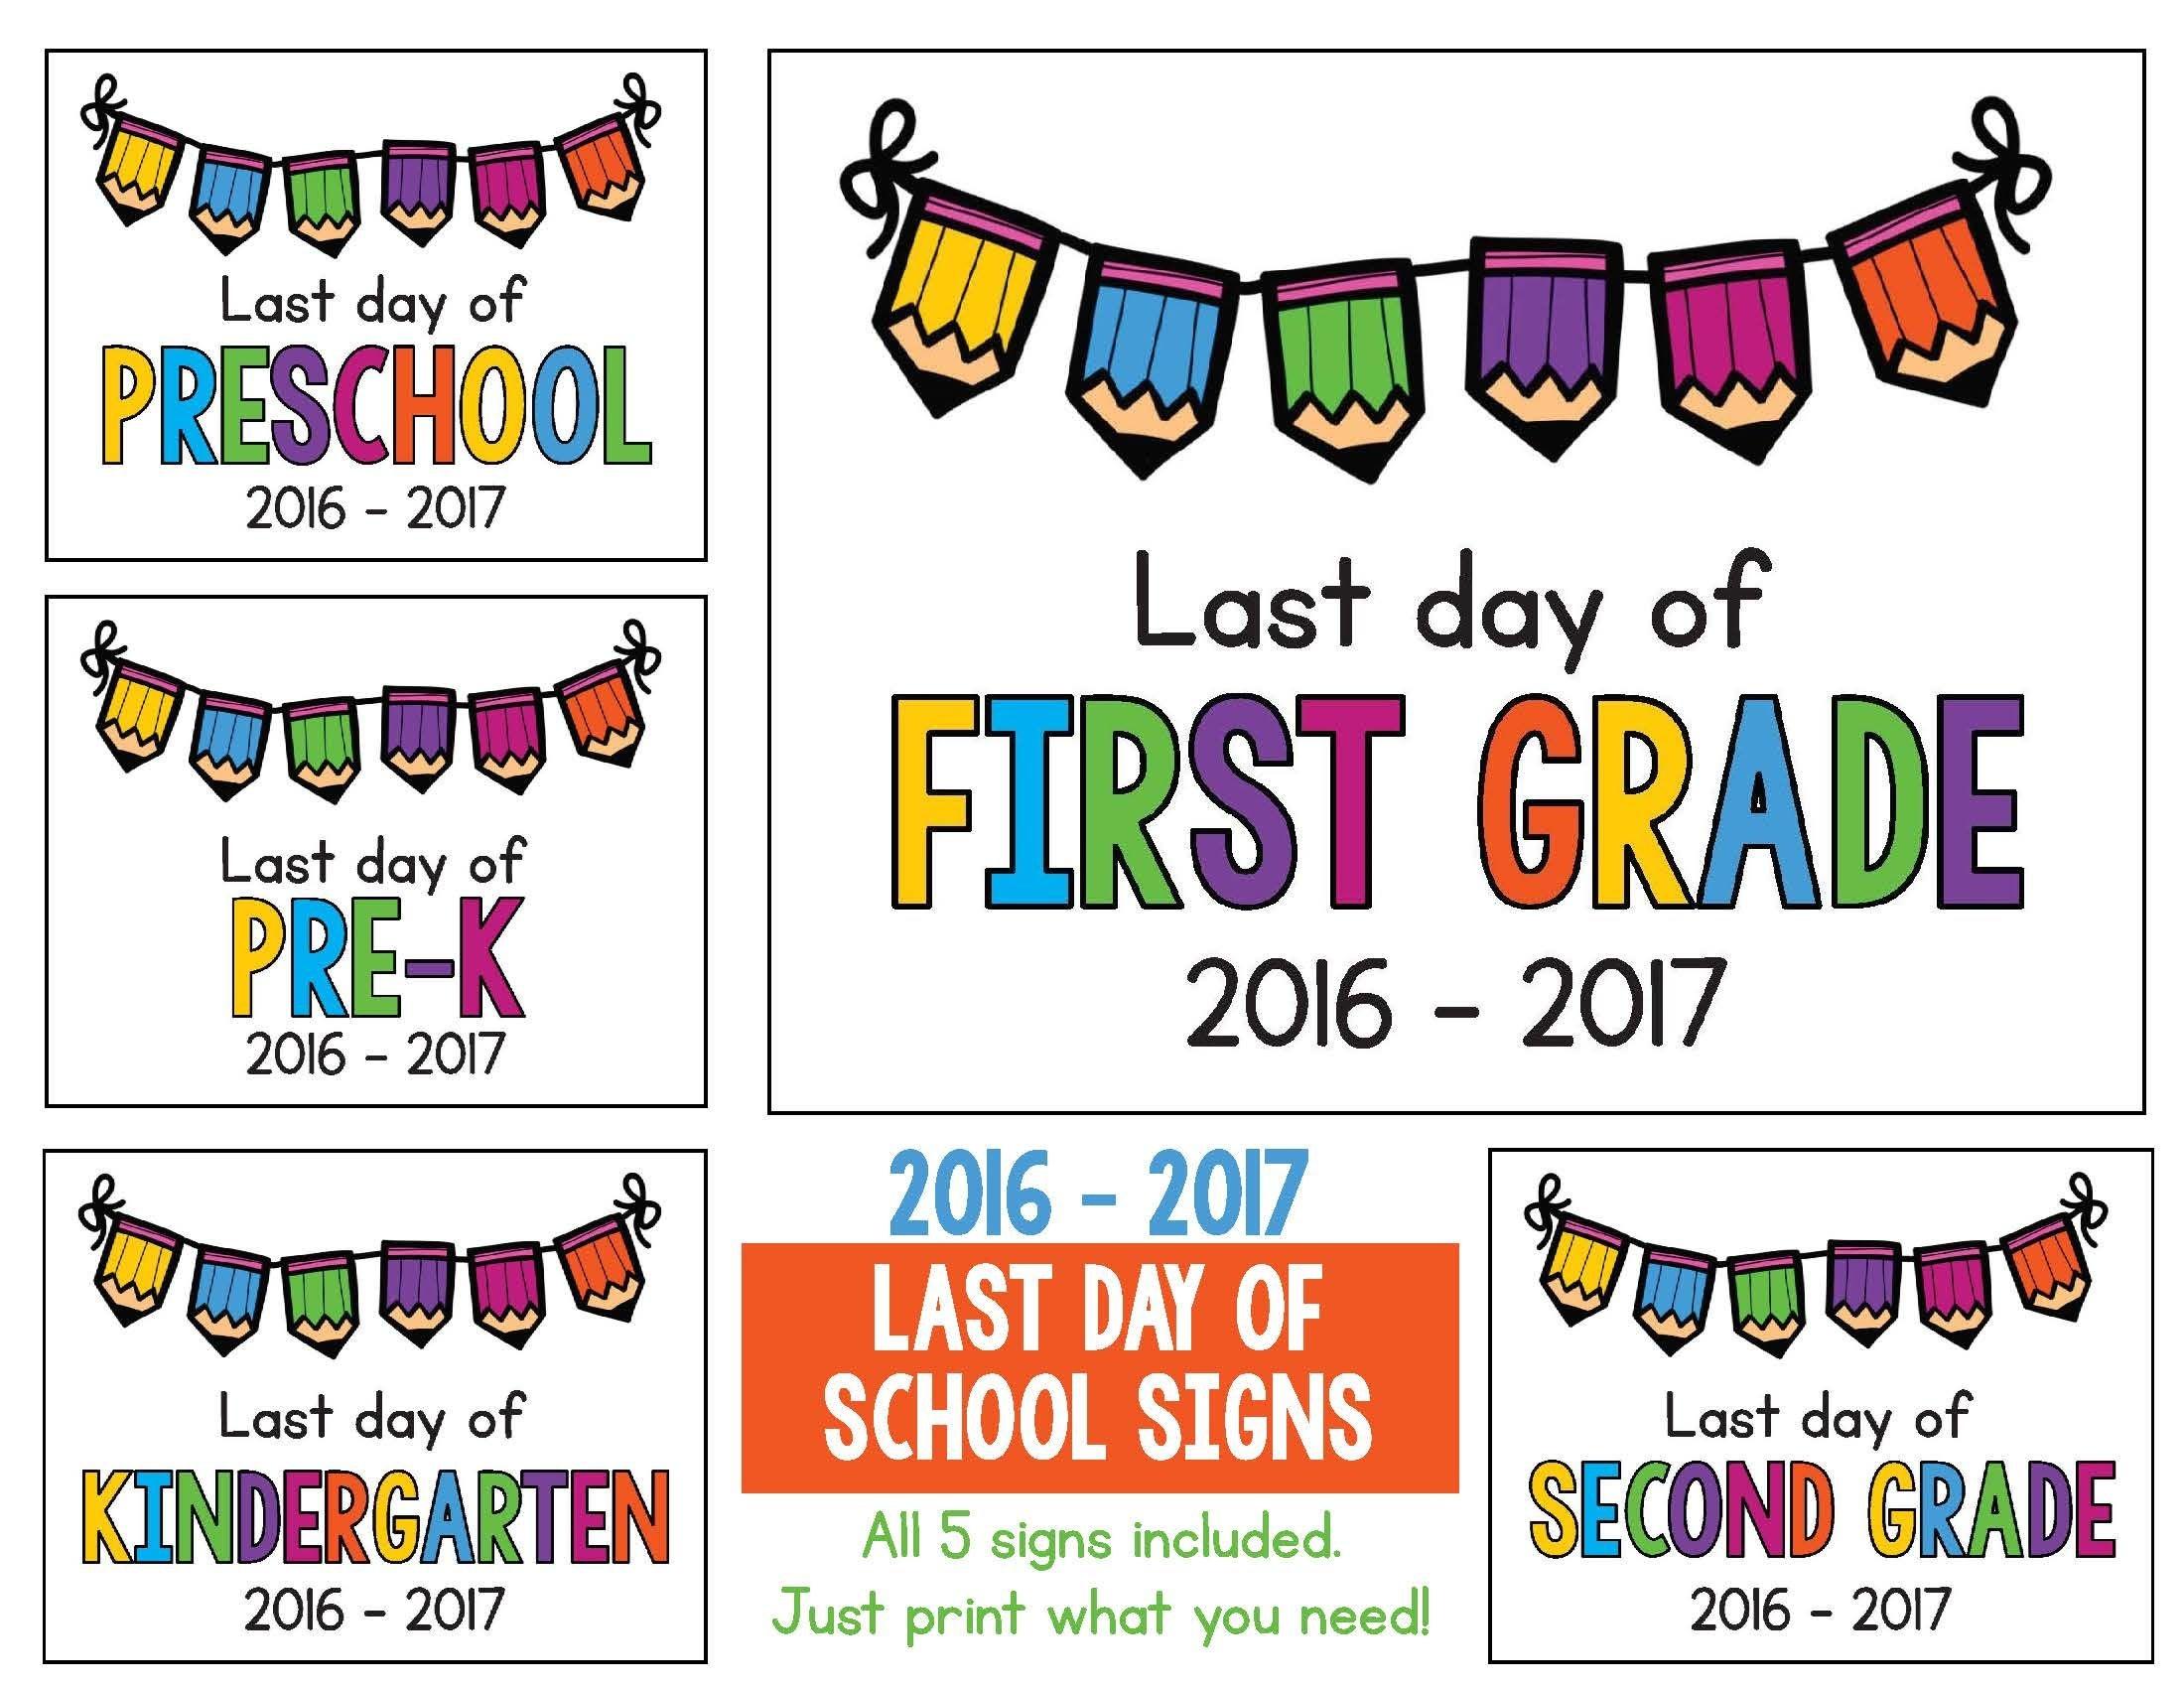 Last Day Of School Signs 2018 - 2019 Freebie: Preschool, Prek - Free Printable First Day Of School Signs 2017 2018